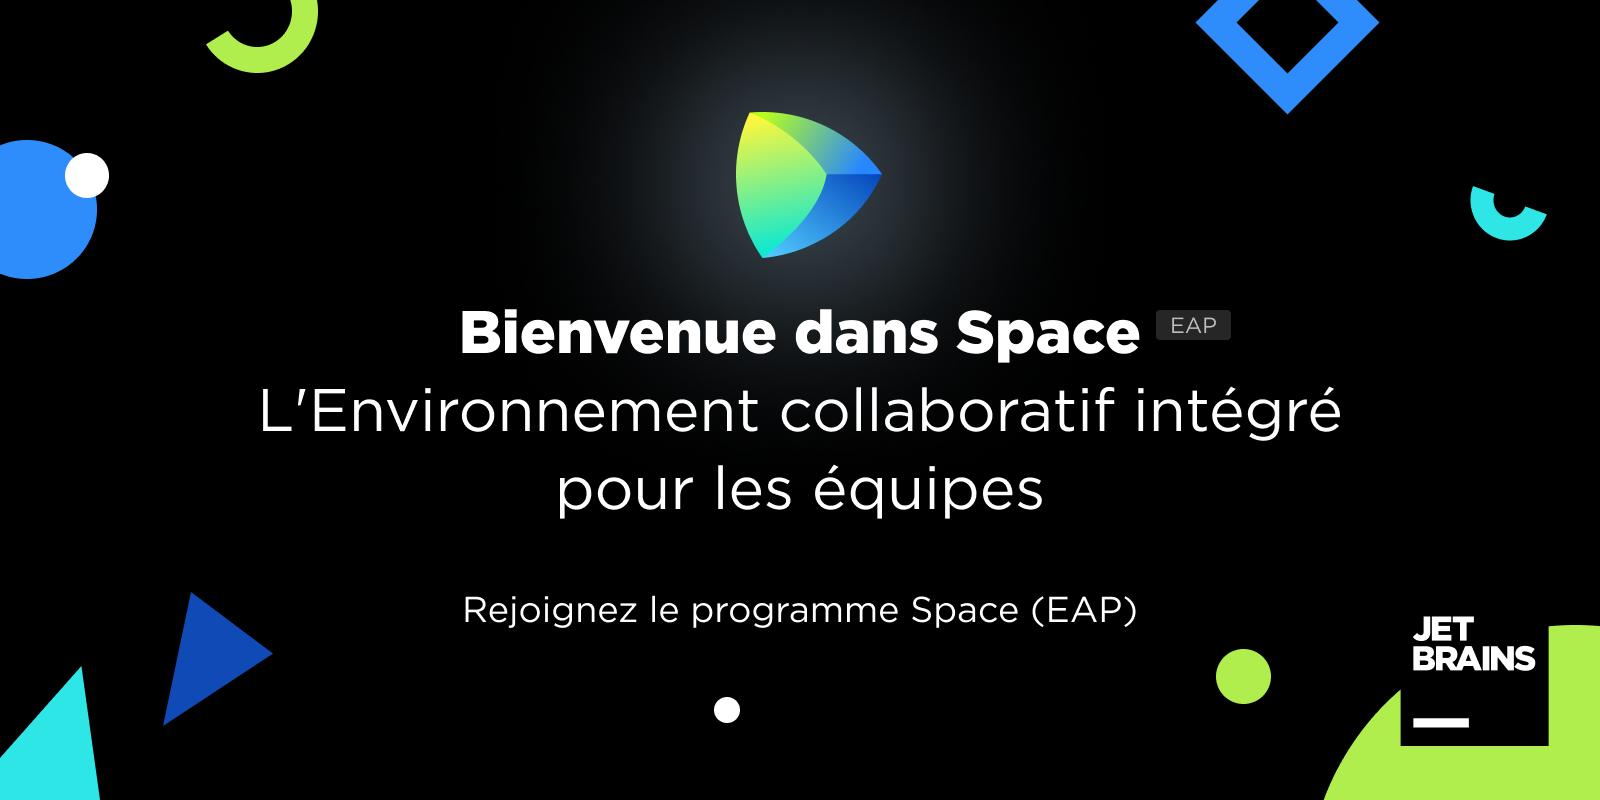 Space EAP